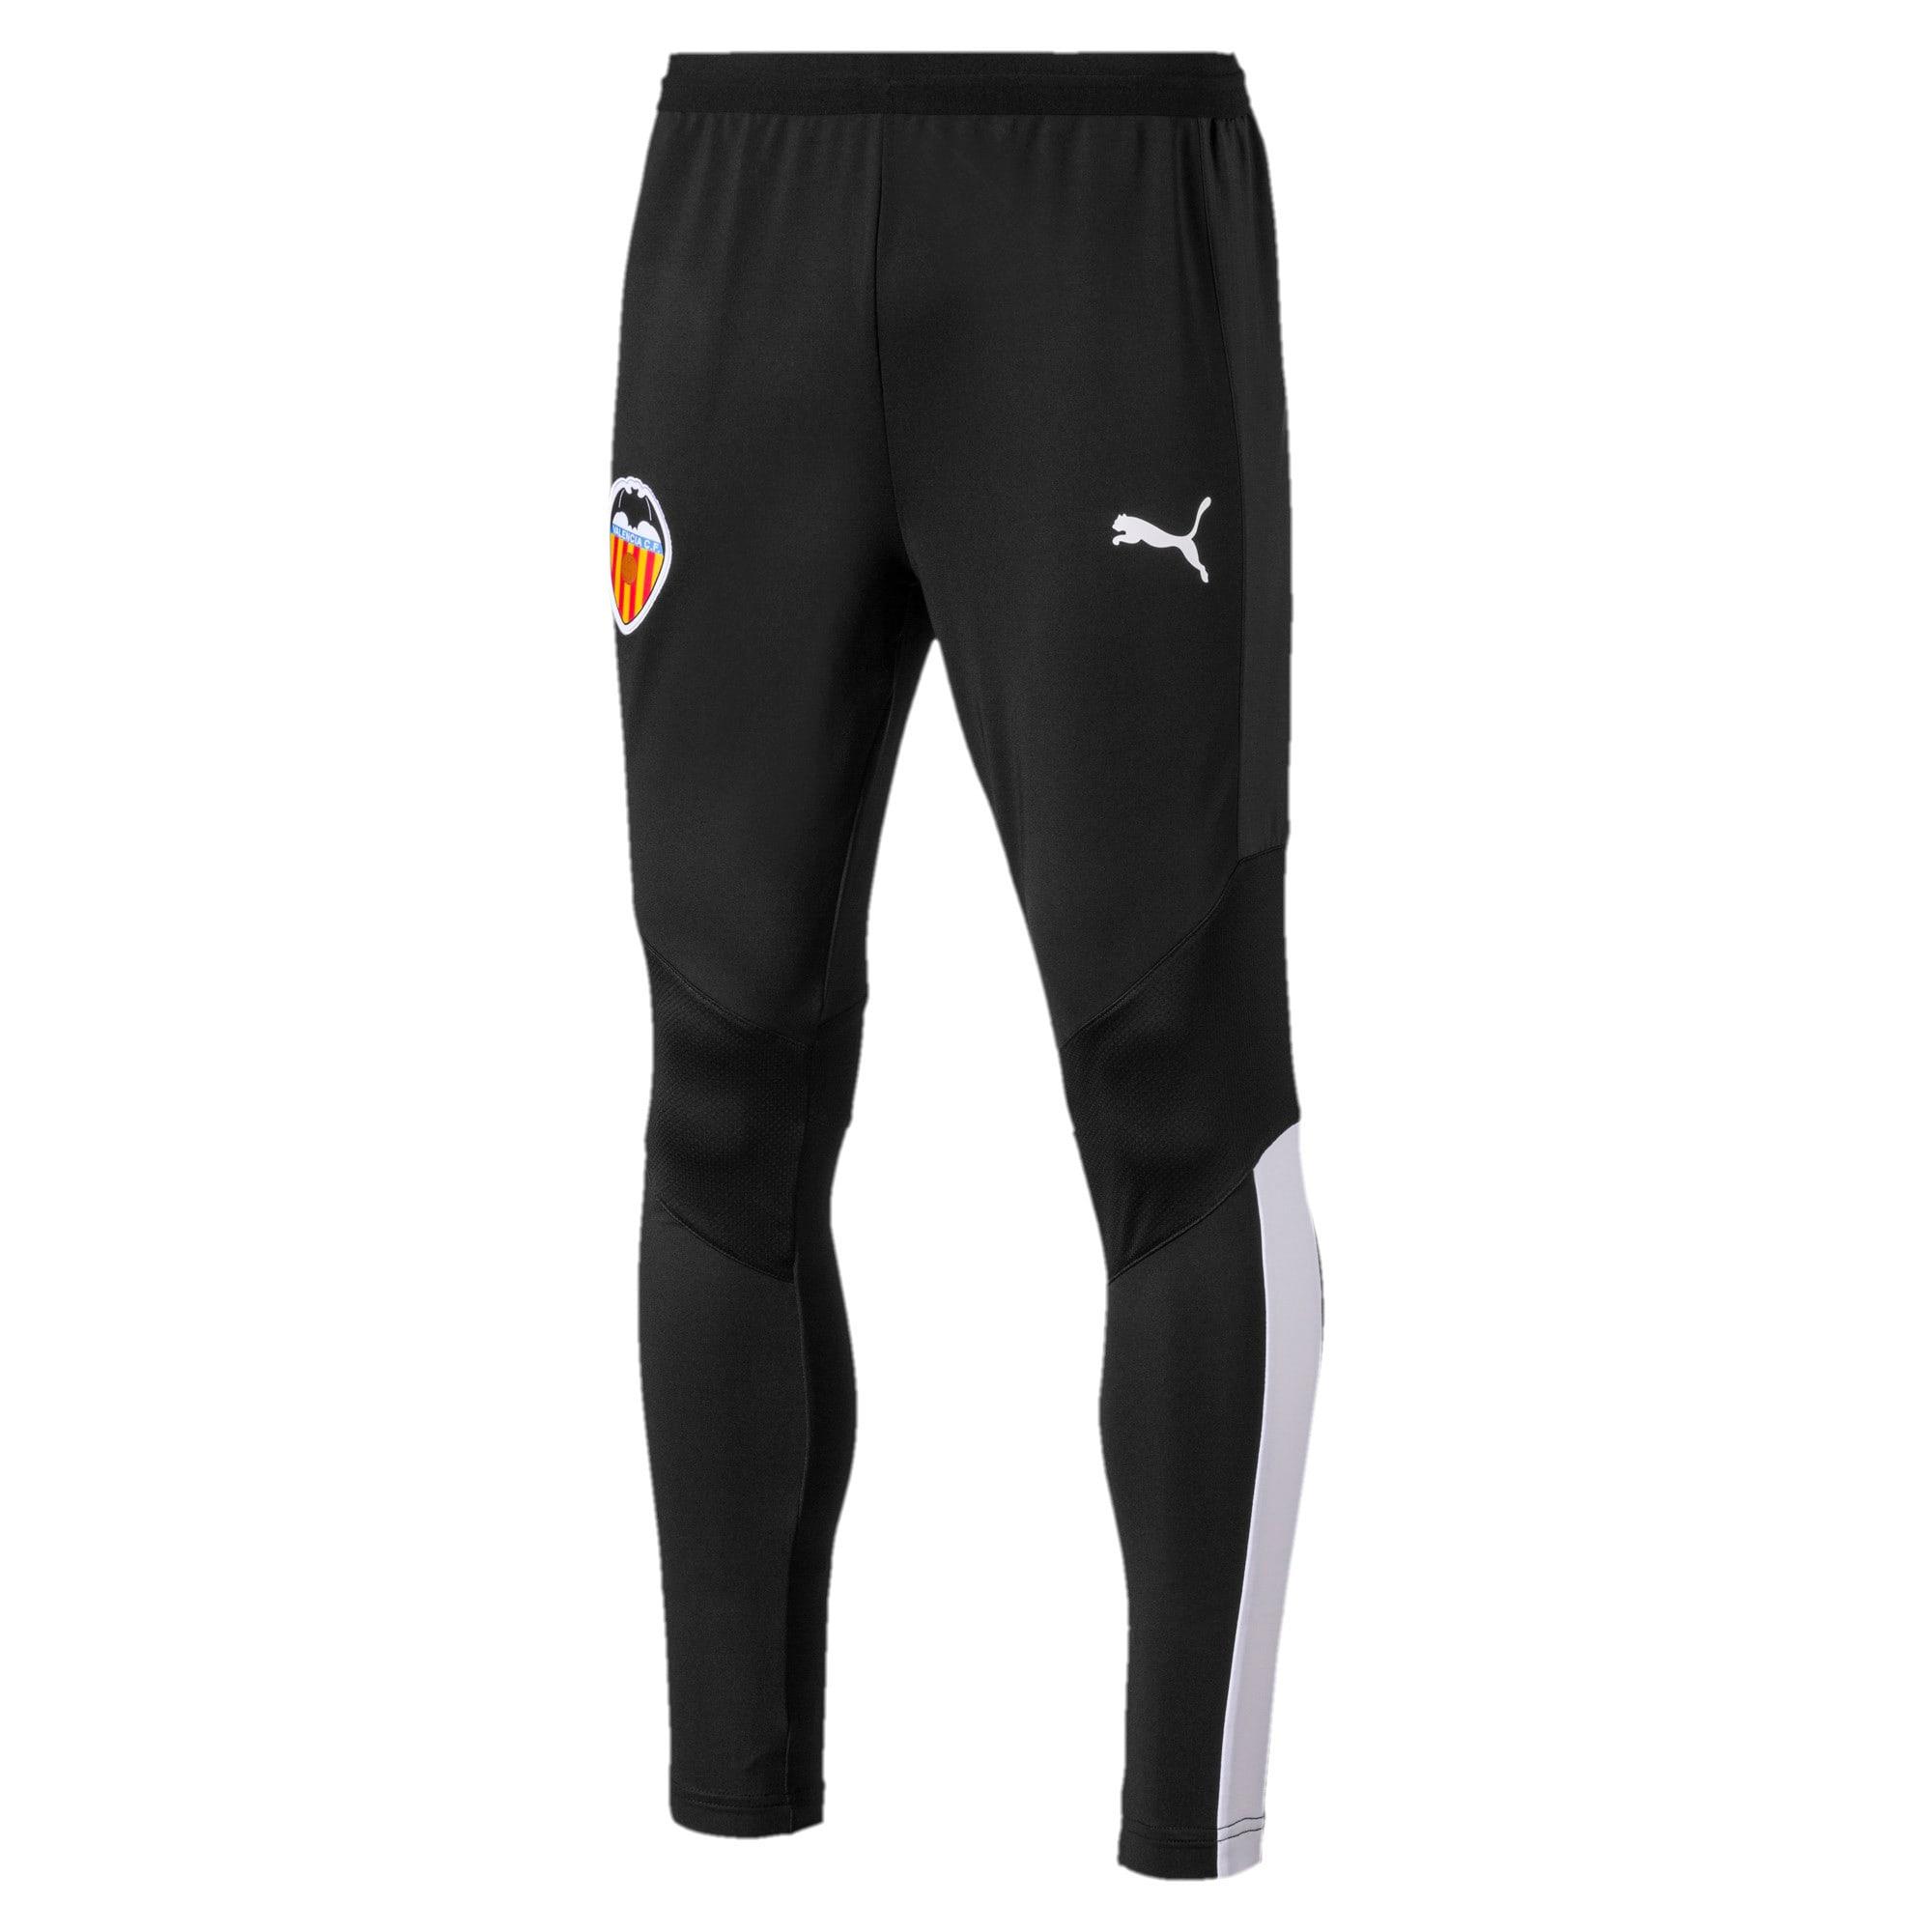 Thumbnail 1 of Valencia CF Men's Training Pants, Puma Black-Puma White, medium